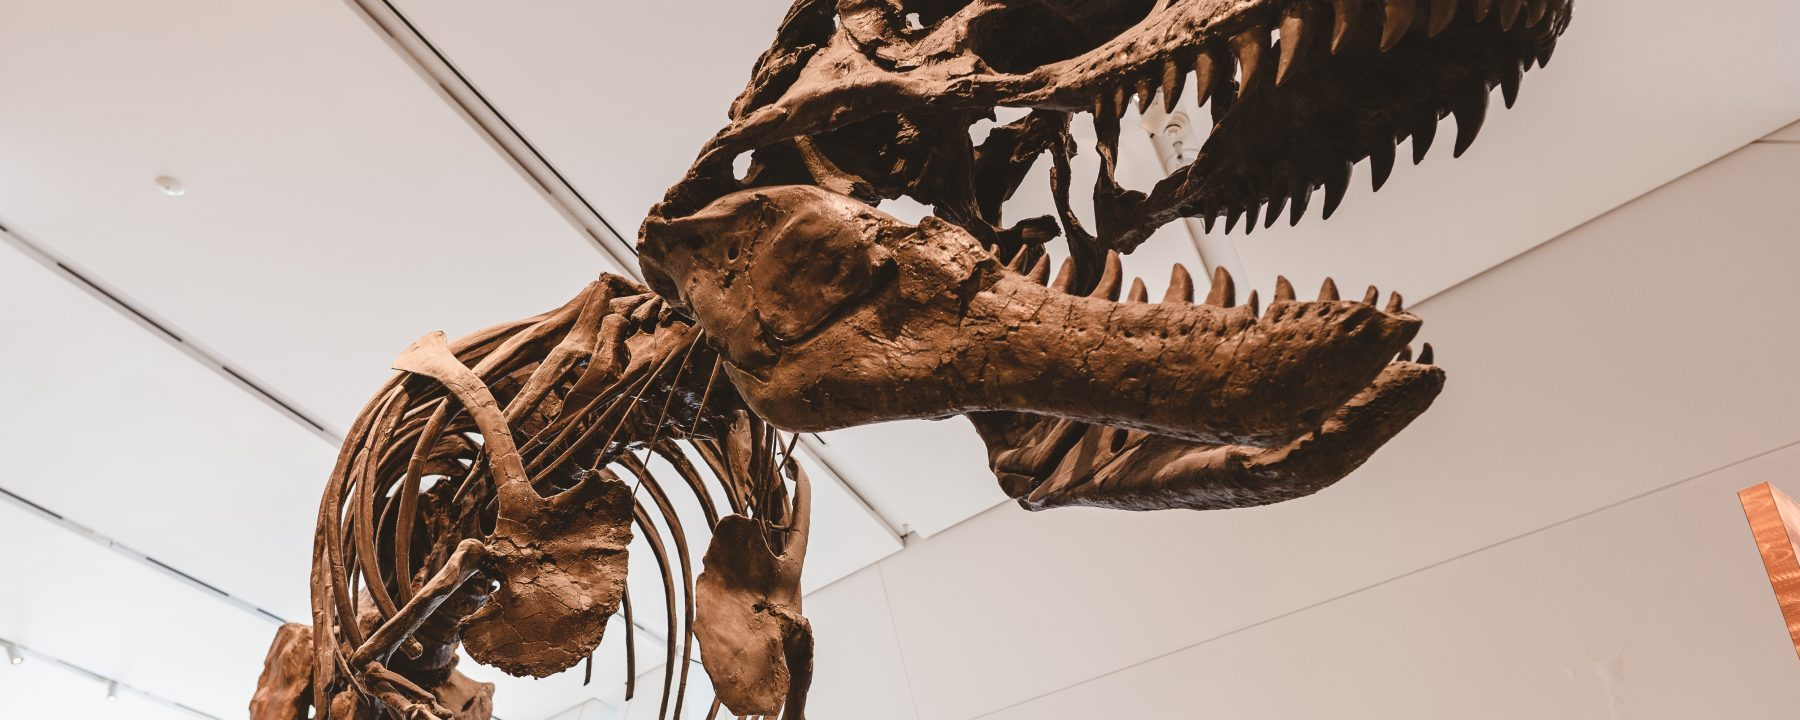 Innovation workshop disruption teknik cannibal spil dinosaur